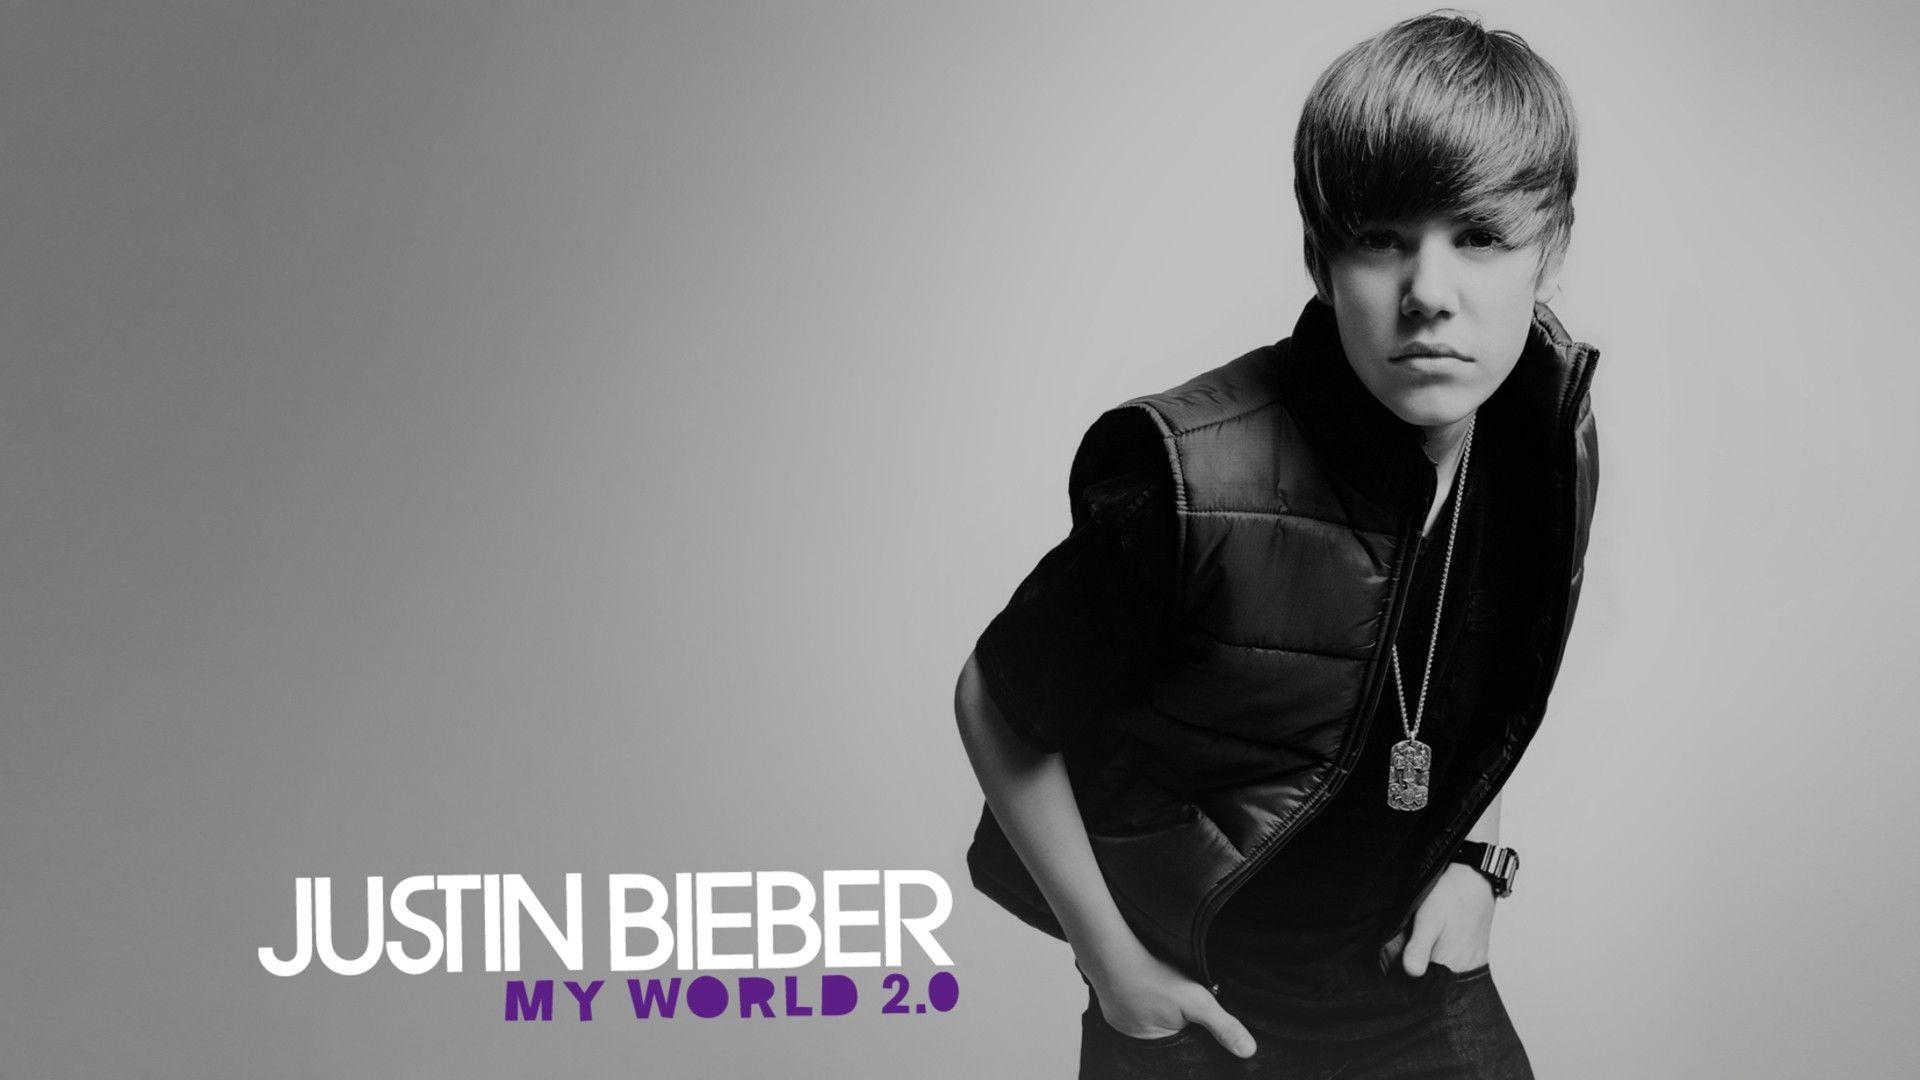 Justin Bieber Image Wallpapers (68 Wallpapers)